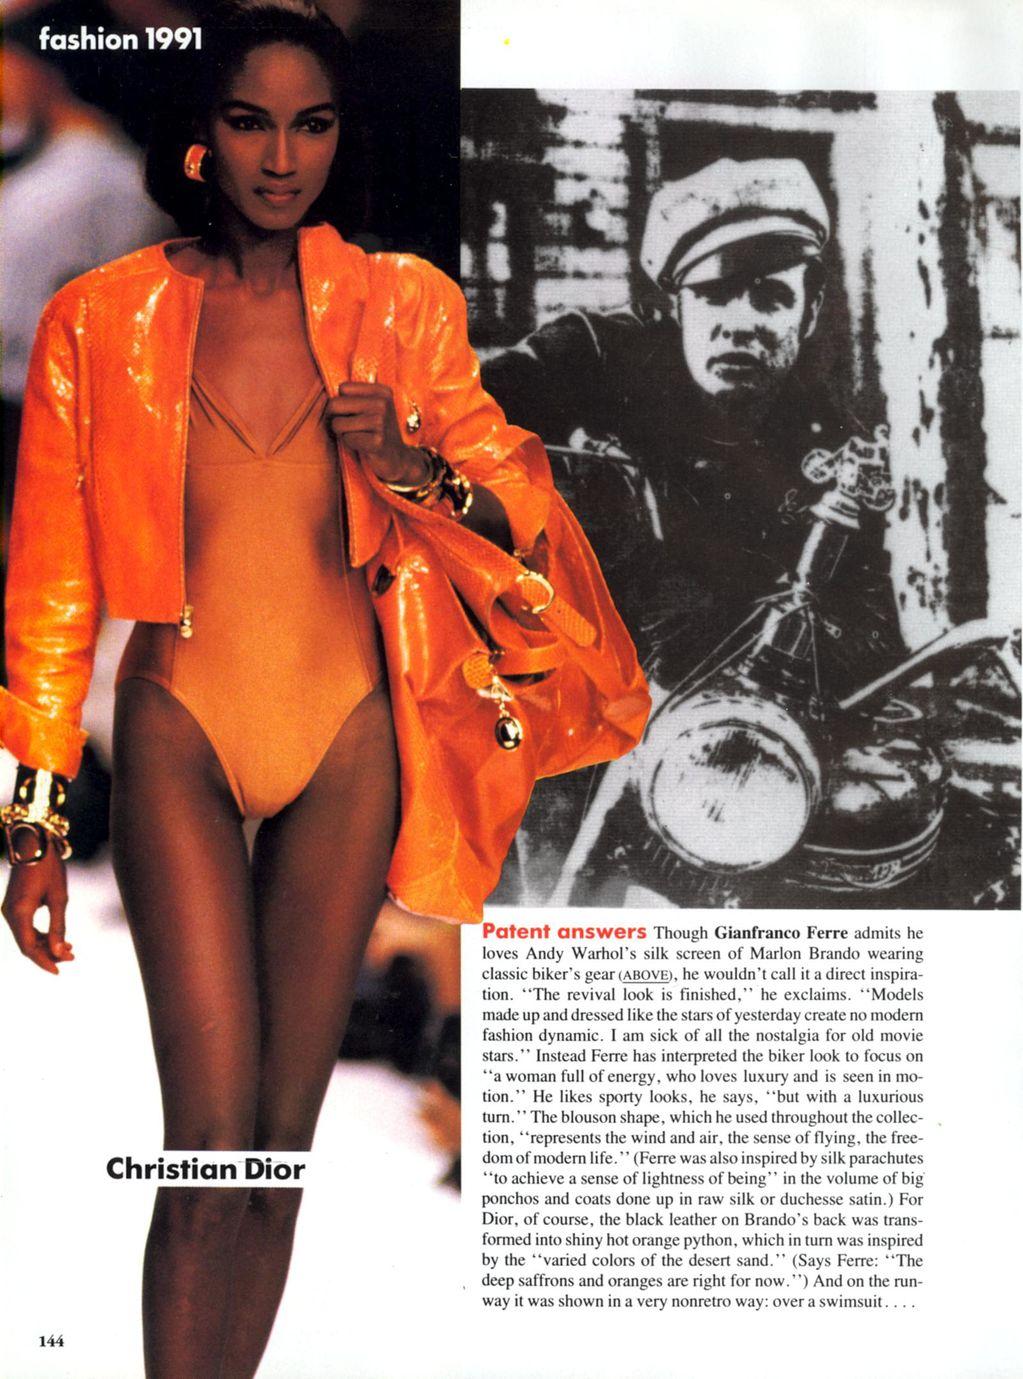 Vogue (US) January 1991 | Fashion 1991 13.jpg